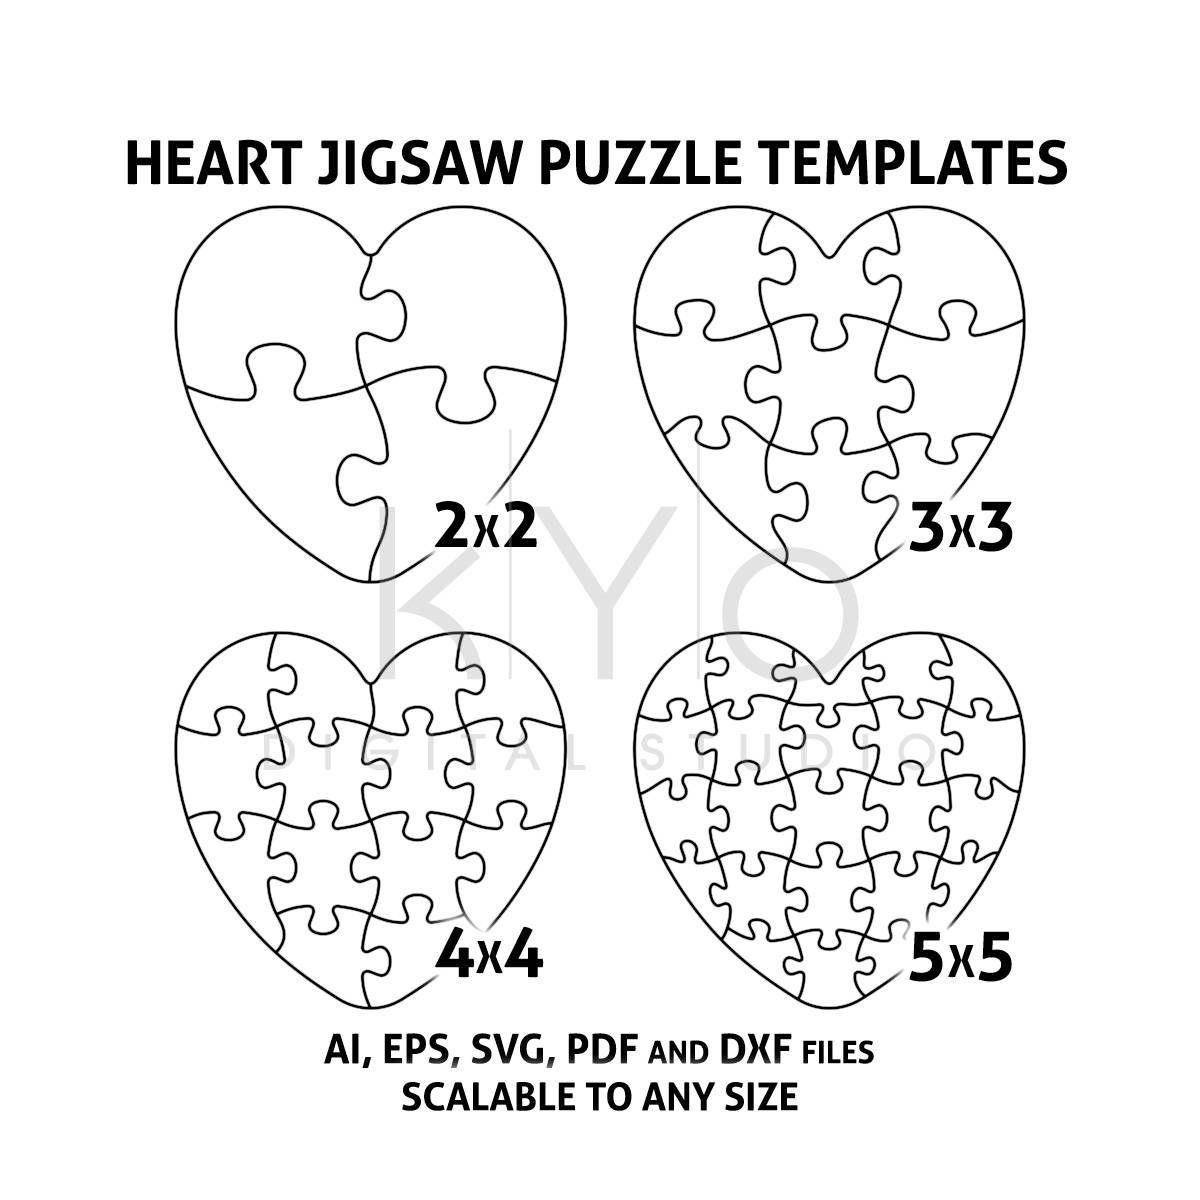 Heart Jigsaw Puzzle Templates Ai Eps Svg Pdf Dxf Files, Heart Shape - 2 Piece Puzzle Printable